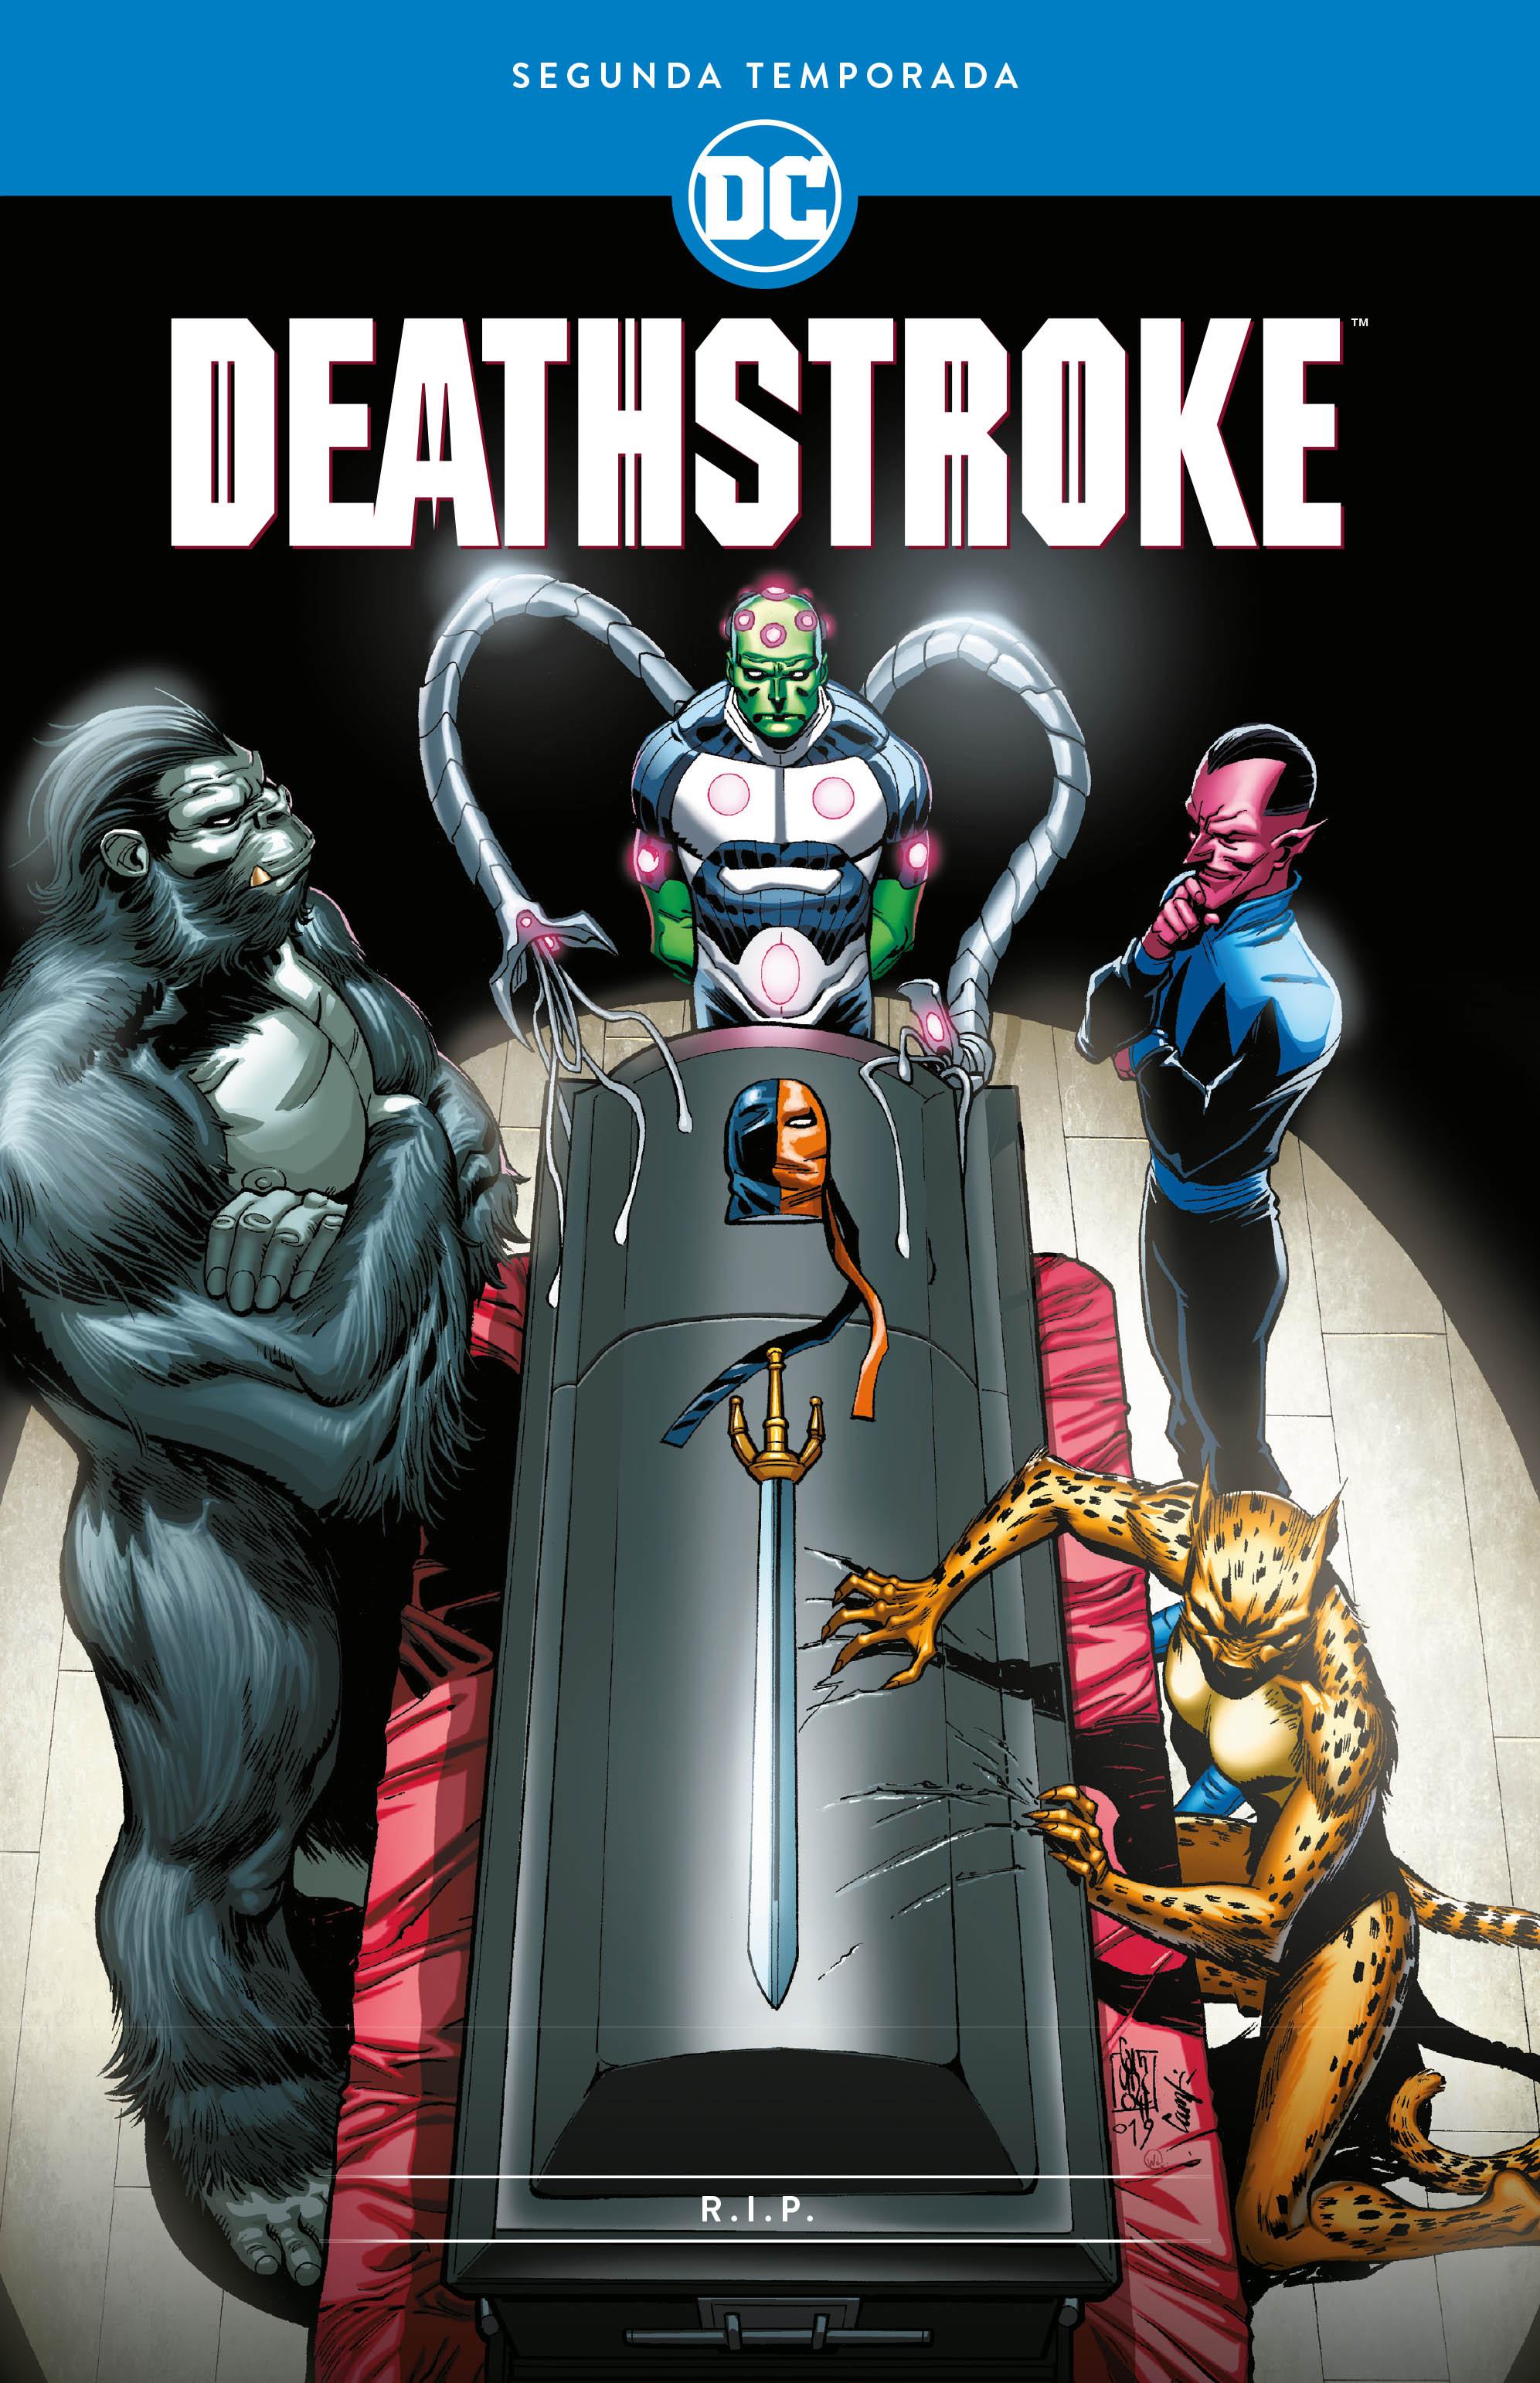 Deathstroke: Segunda temporada – R.I.P.